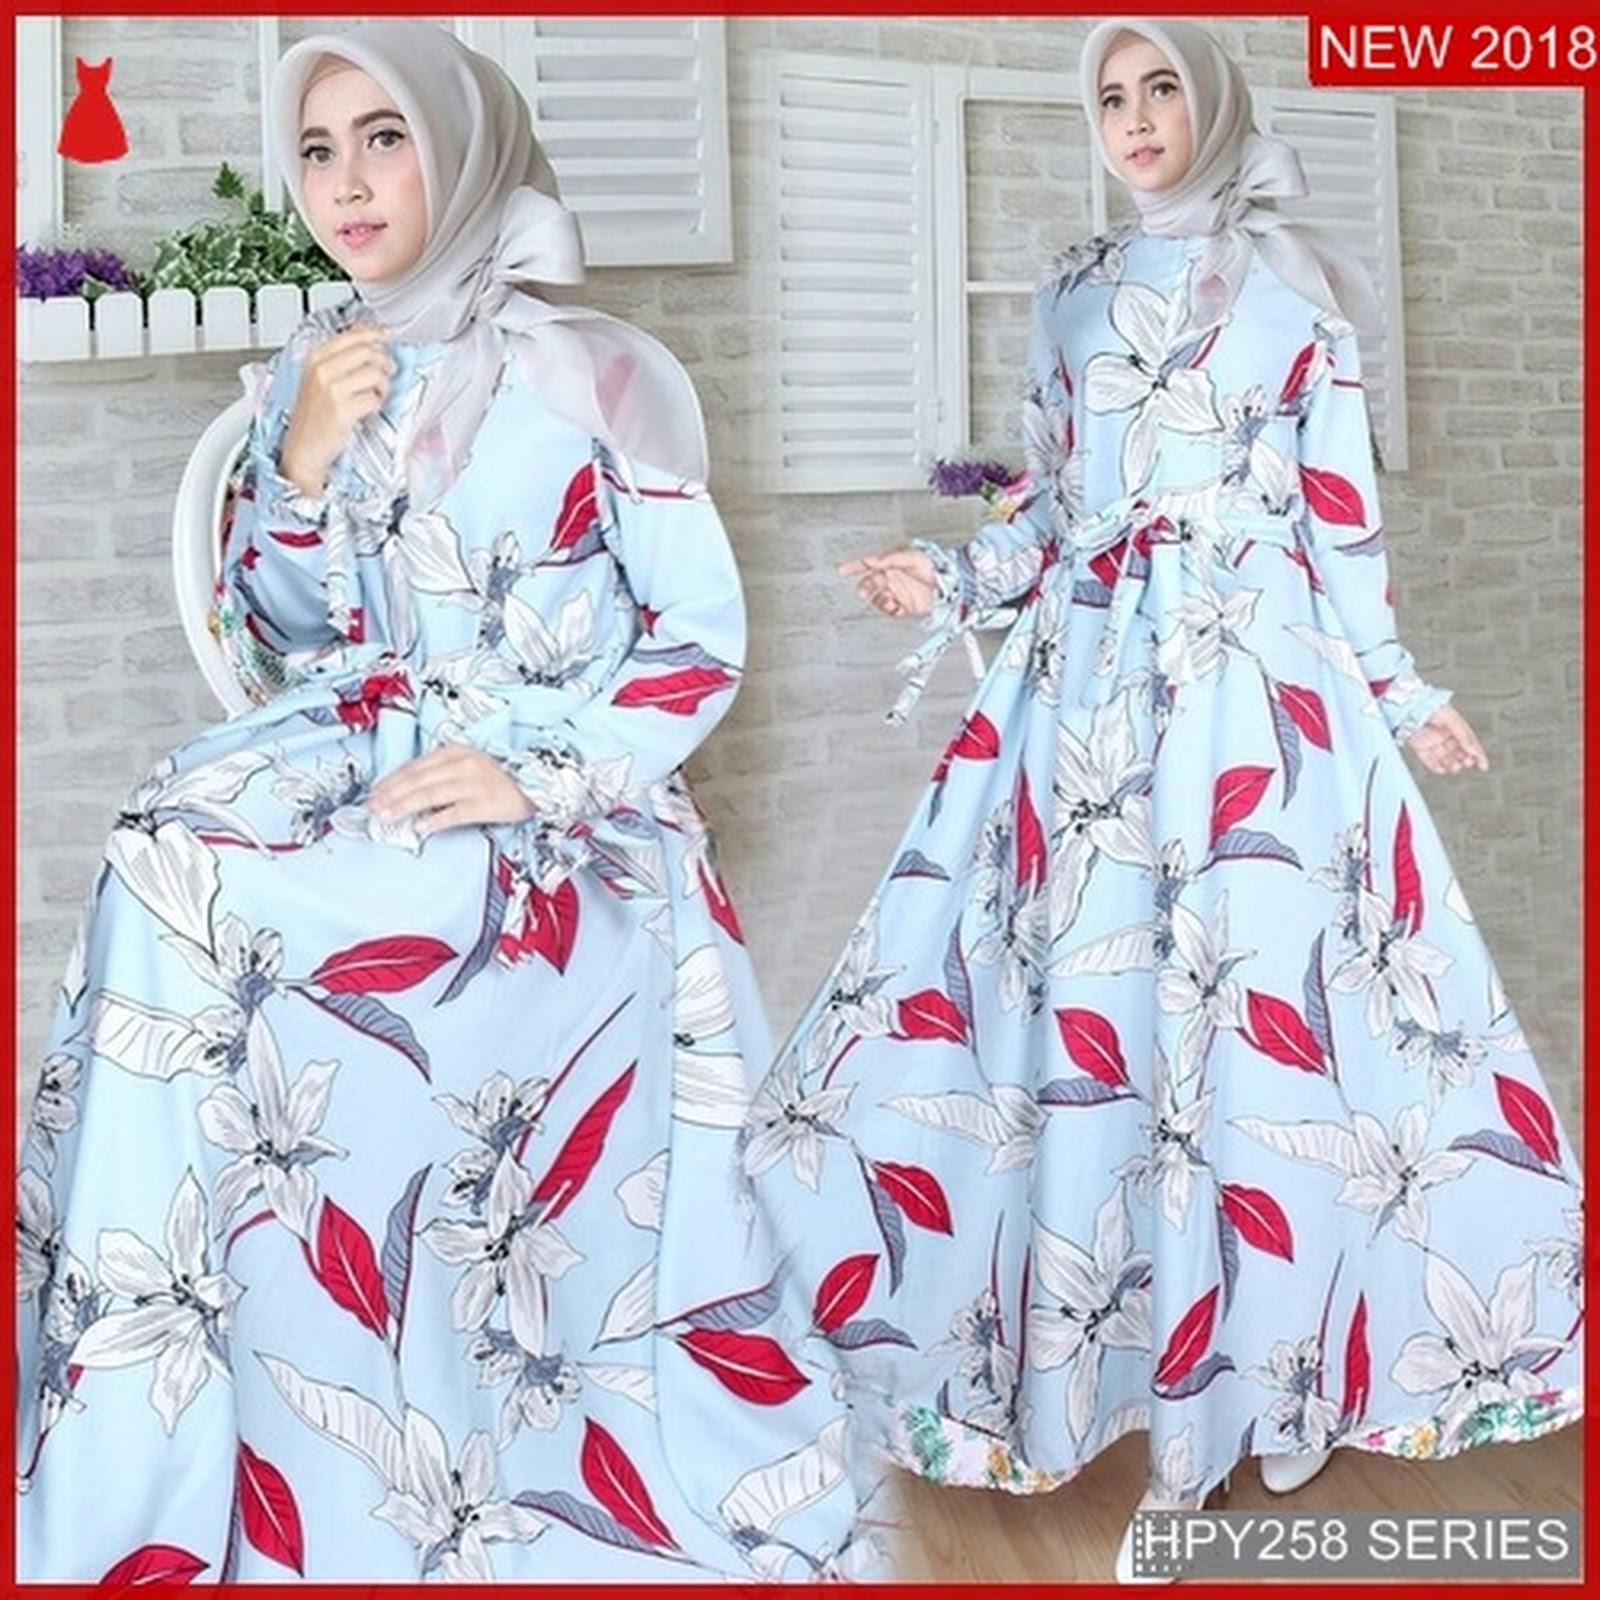 Grosir Dress Maxi 214 Daftar Harga Terkini Dan Terlengkap Toko Minimal Slvless Bare Blue Mnm0731 40070420049 Biru L Hpy258m214 Monalisa